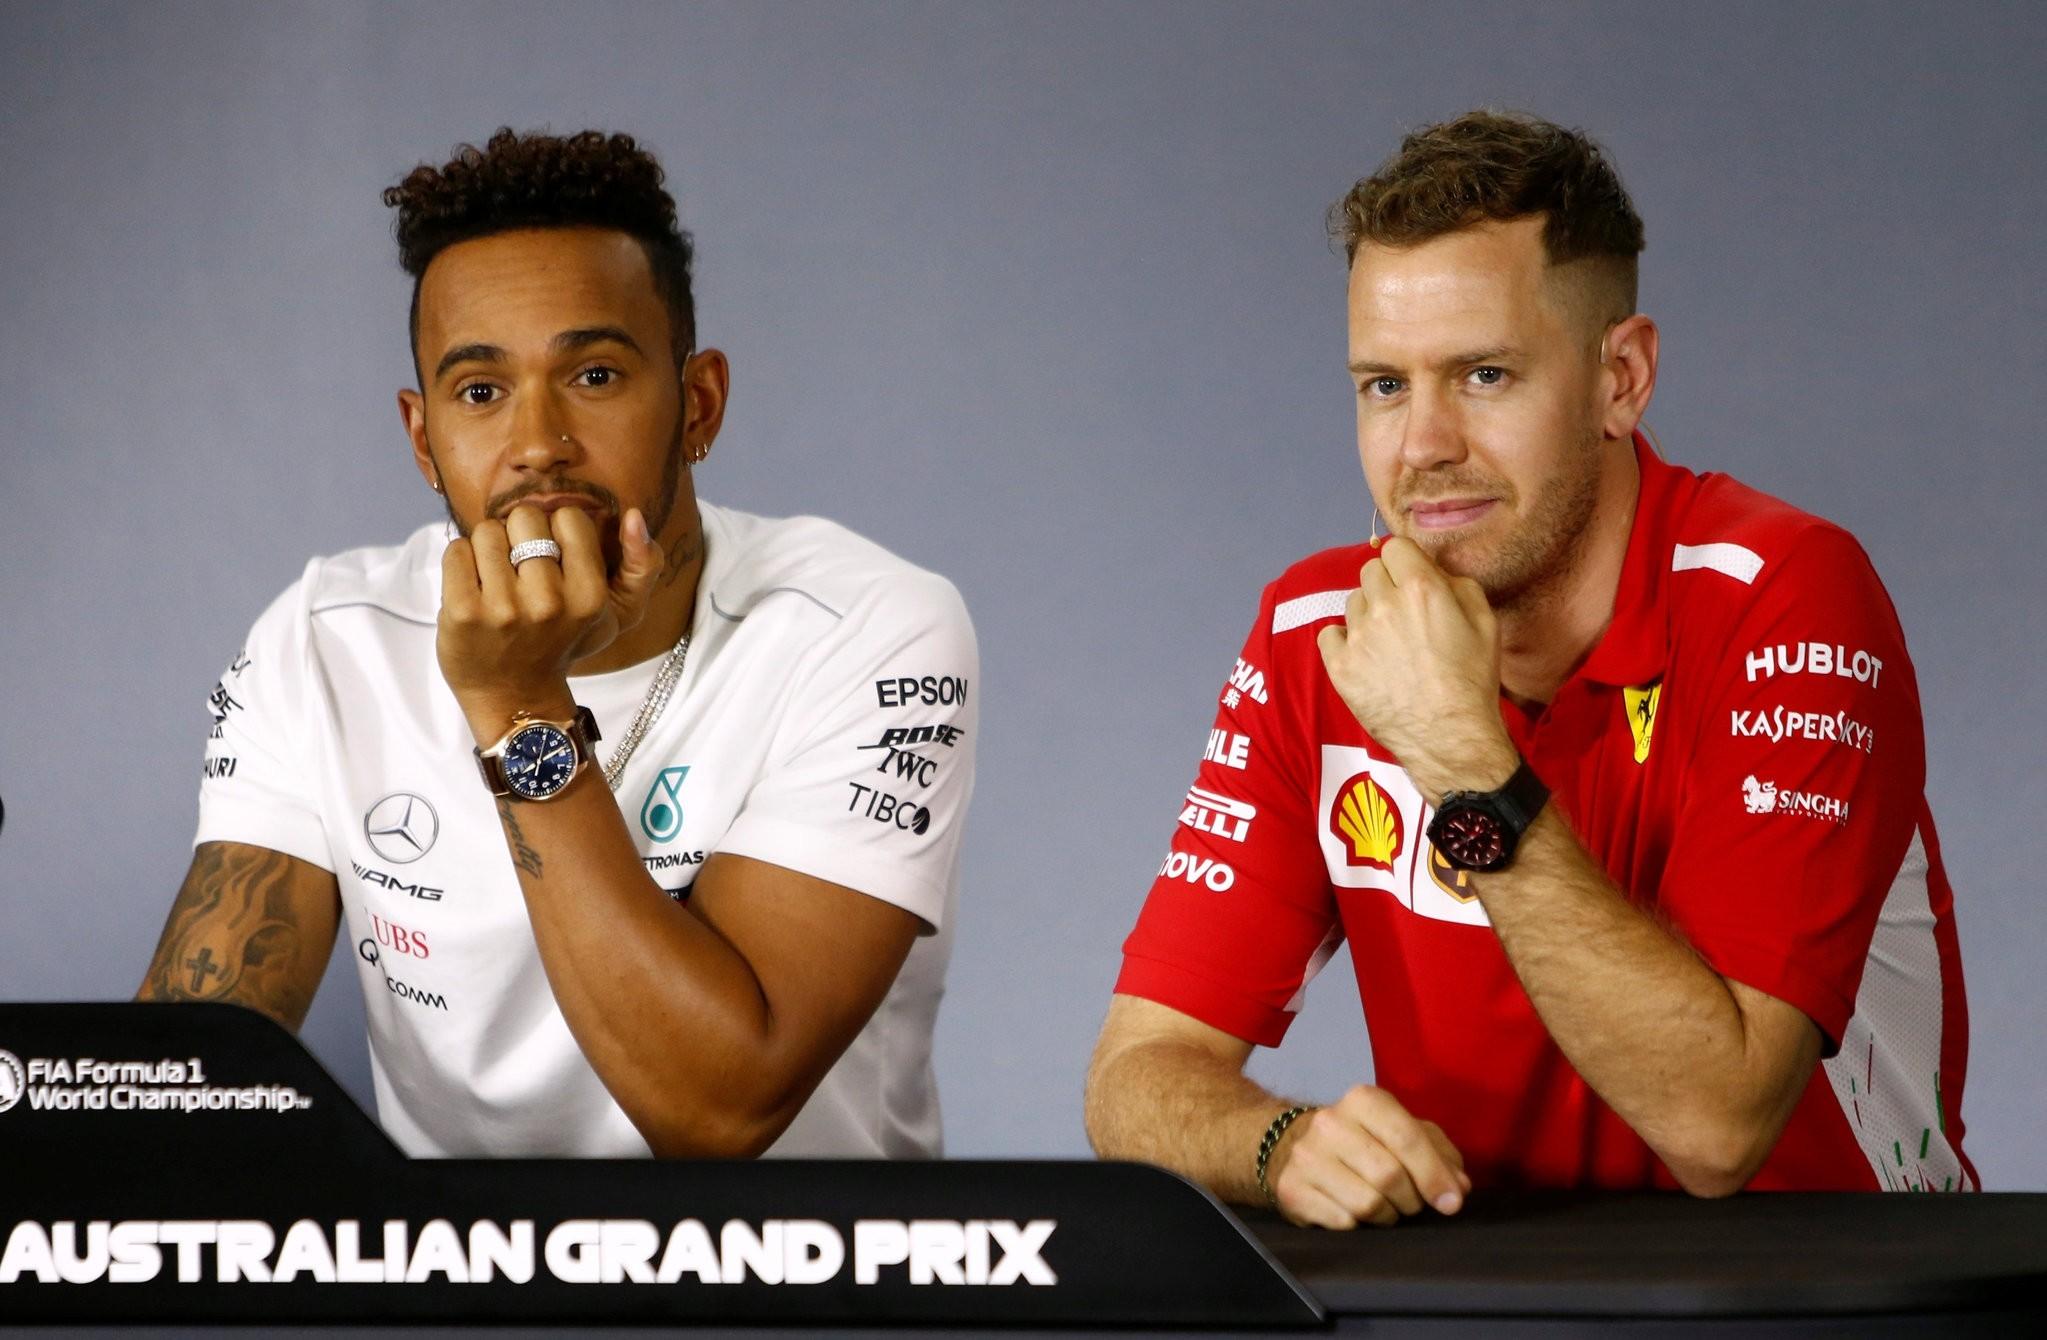 Mercedesu2019s British driver Lewis Hamilton (L) and Ferrariu2019s German driver Sebastian Vettel attend a press conference at the Albert Park circuit in Melbourne ahead of the Formula One Australian Grand Prix.